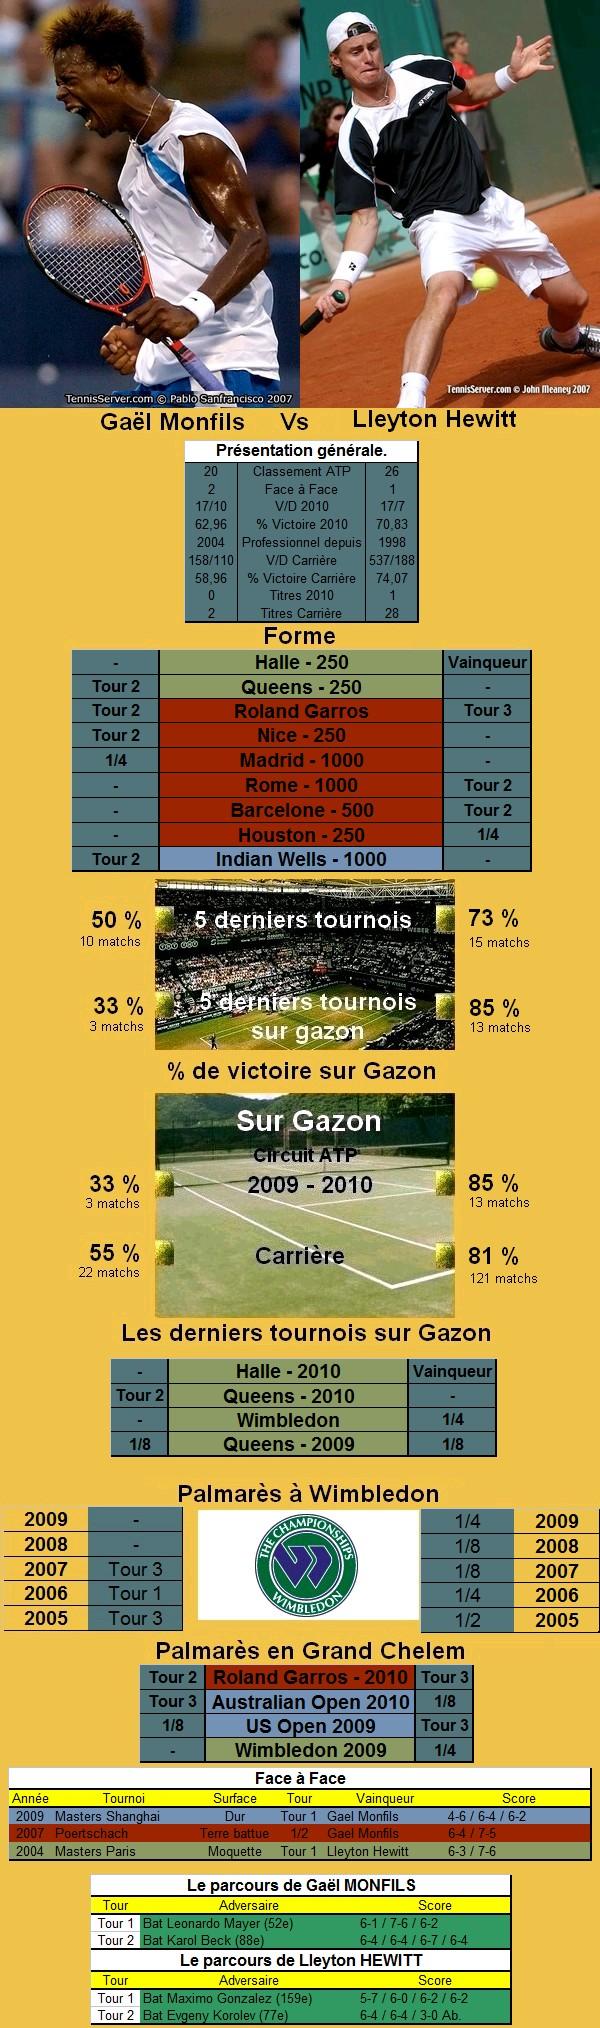 Statistiques tennis de Monfils contre Hewitt à Wimbledon